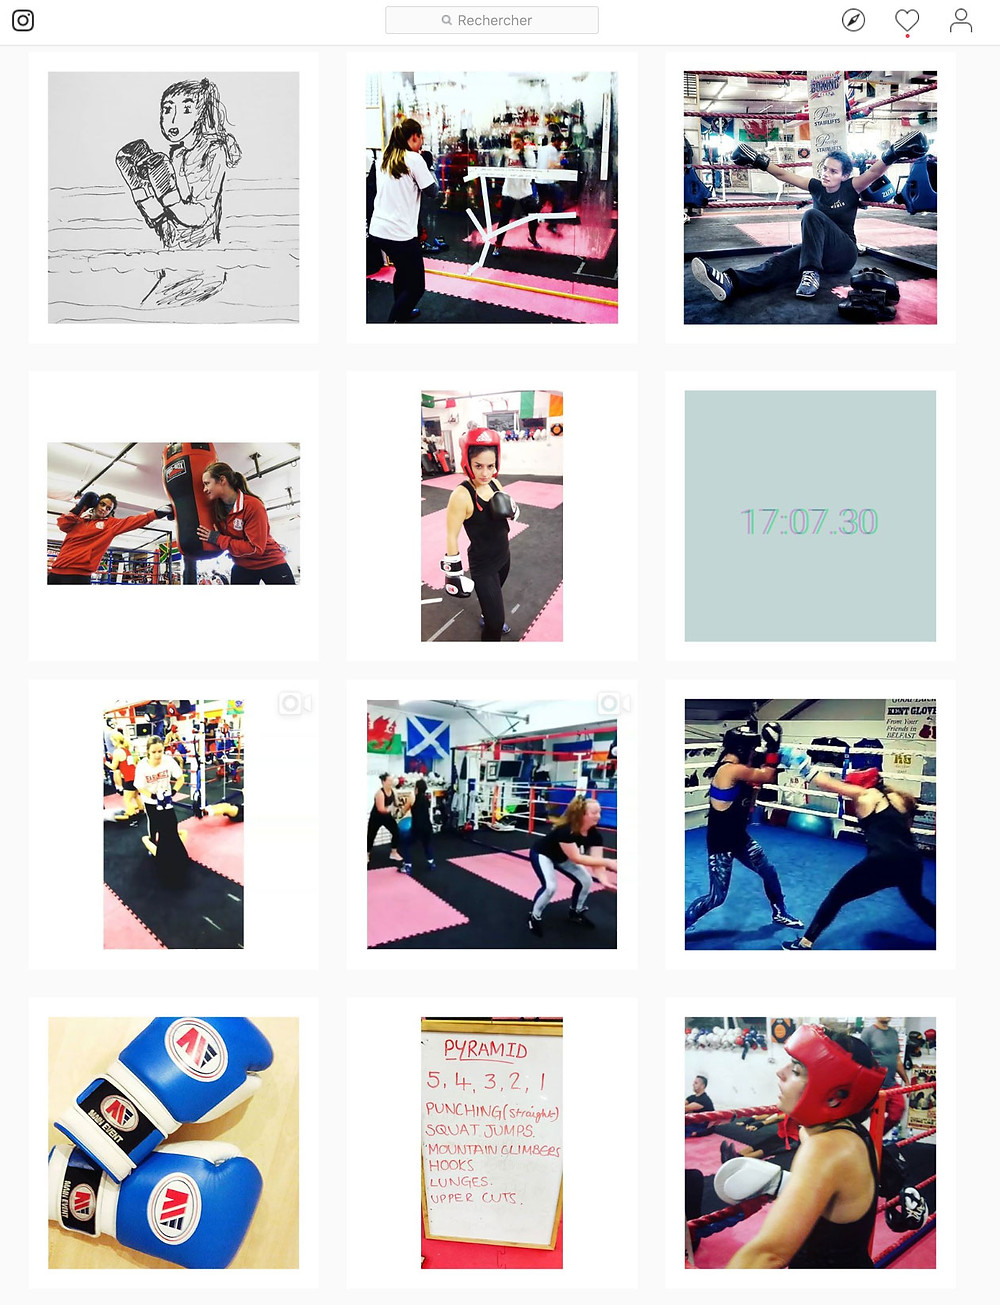 Hitlikegirls, influencer blog, blog, boxing, boxing marketing, camille obligis, digital marketing